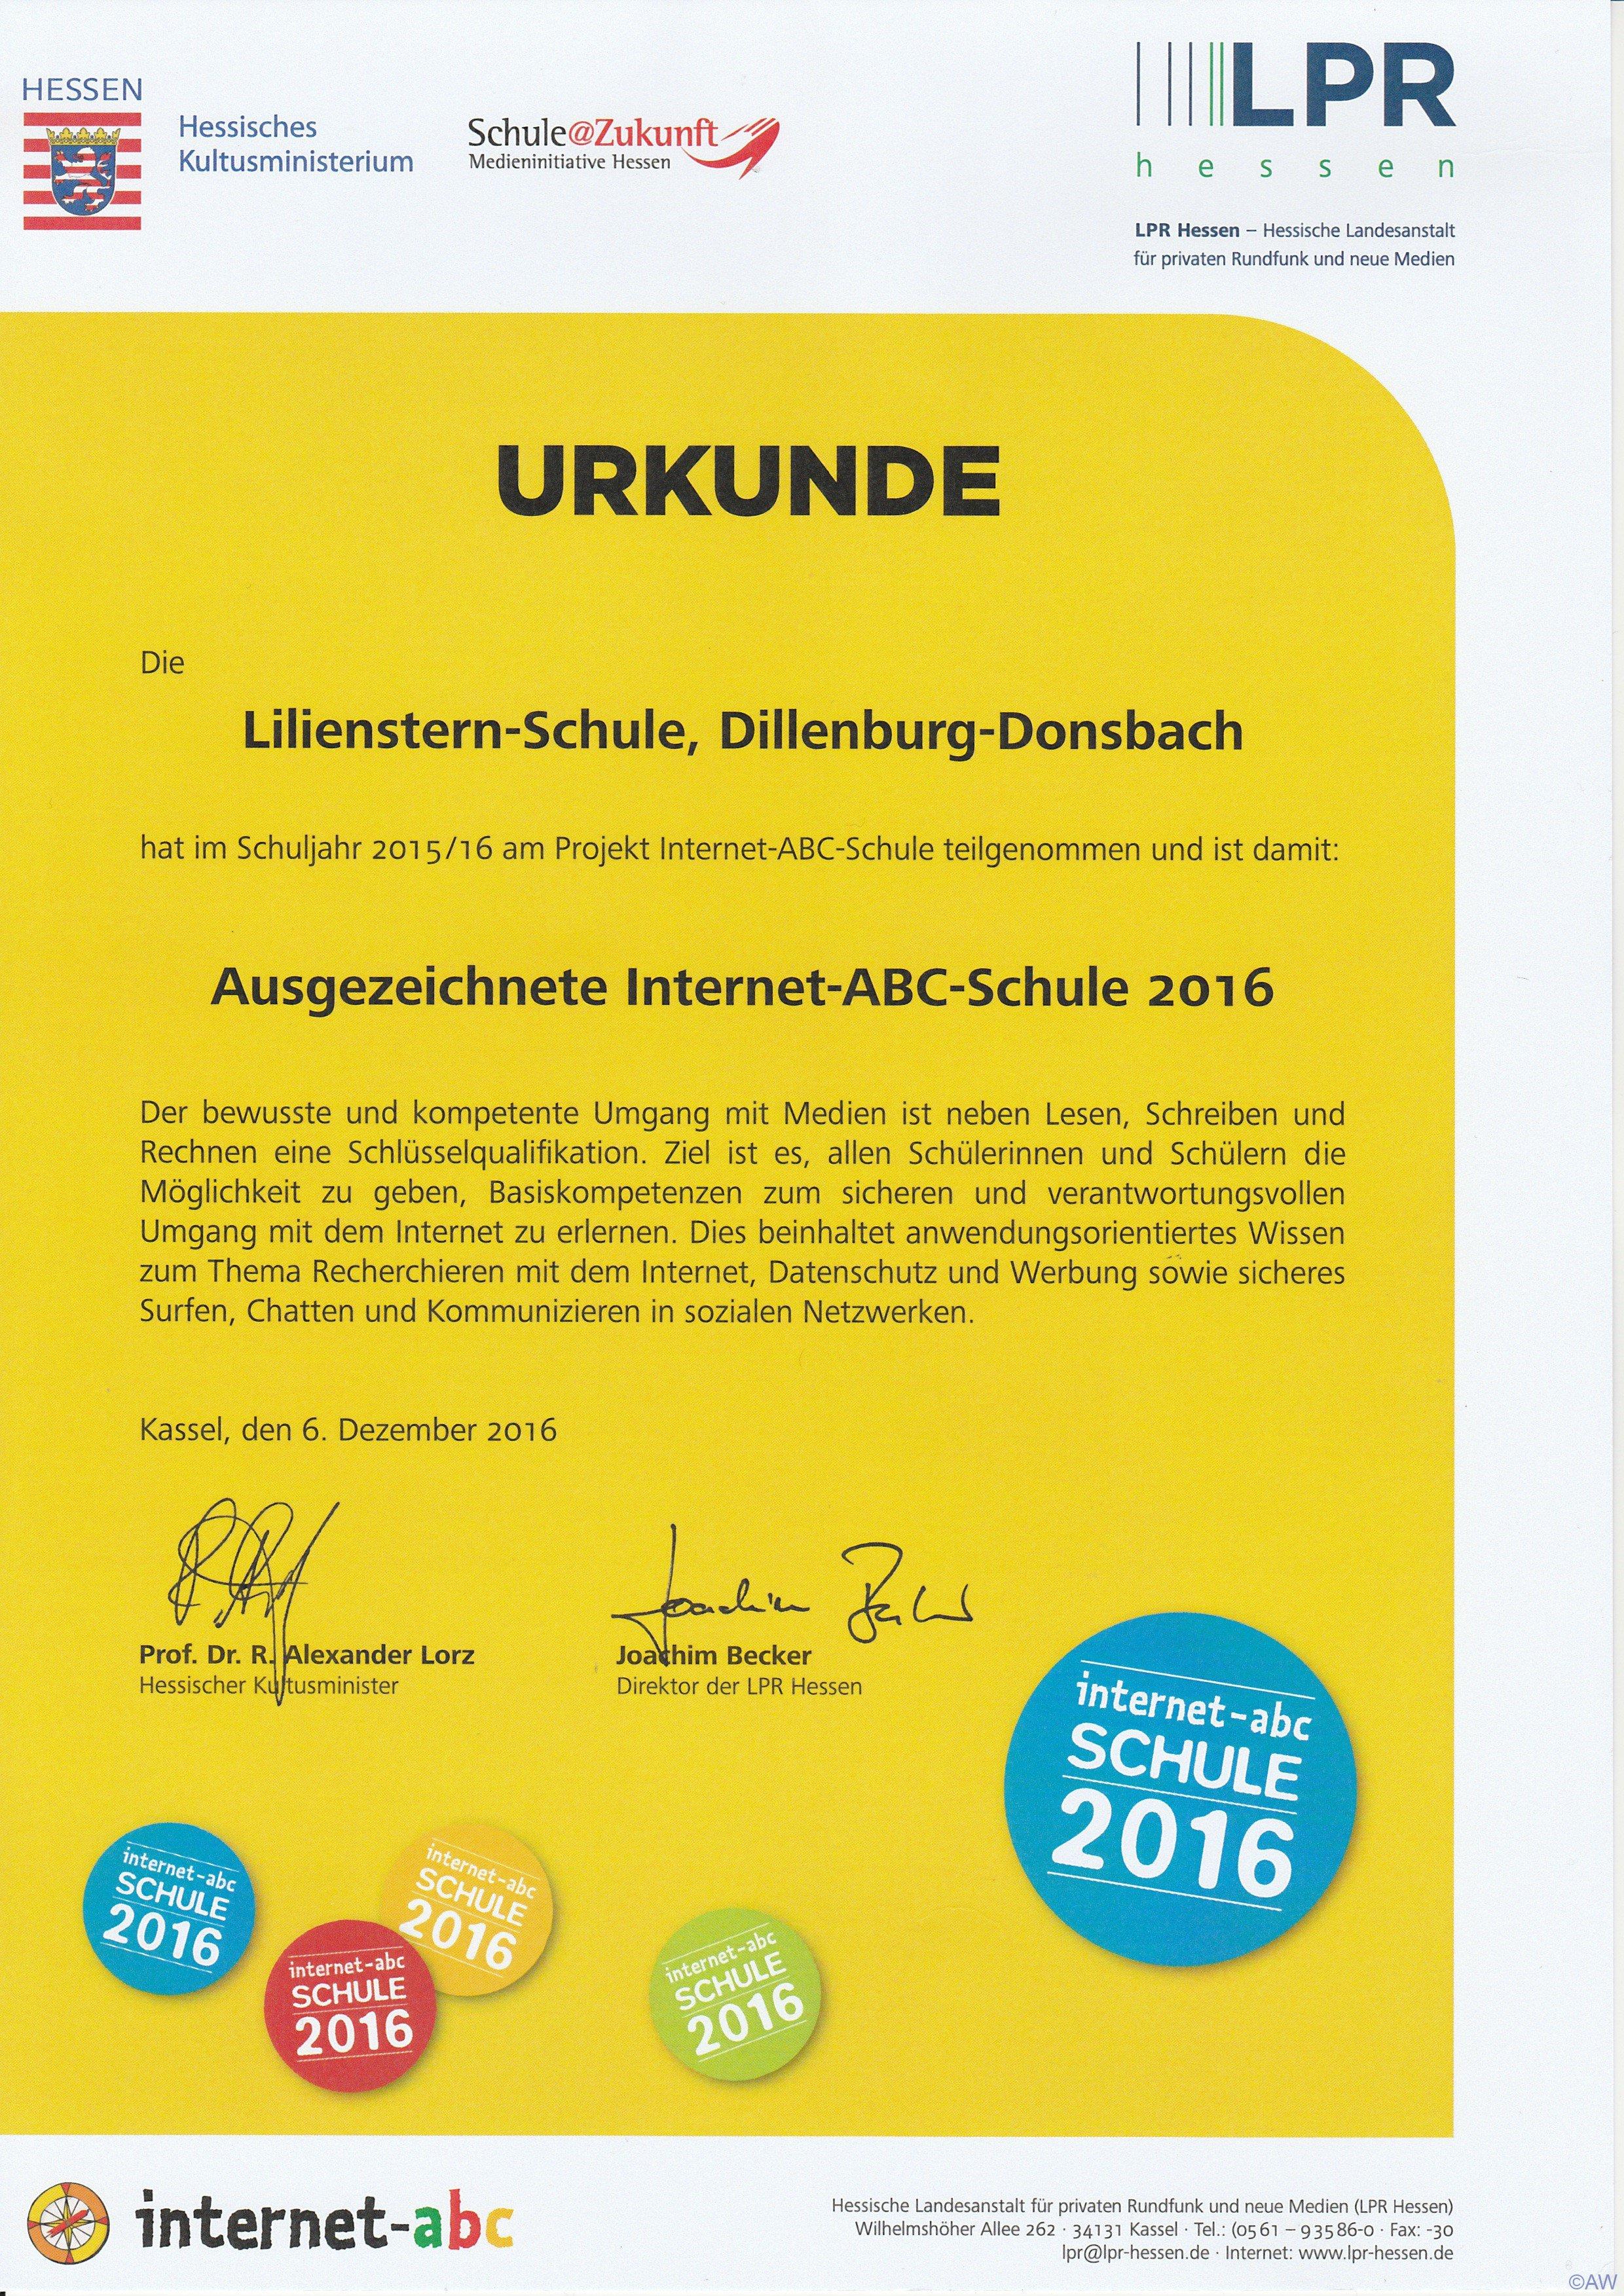 internet-abc-schule2016